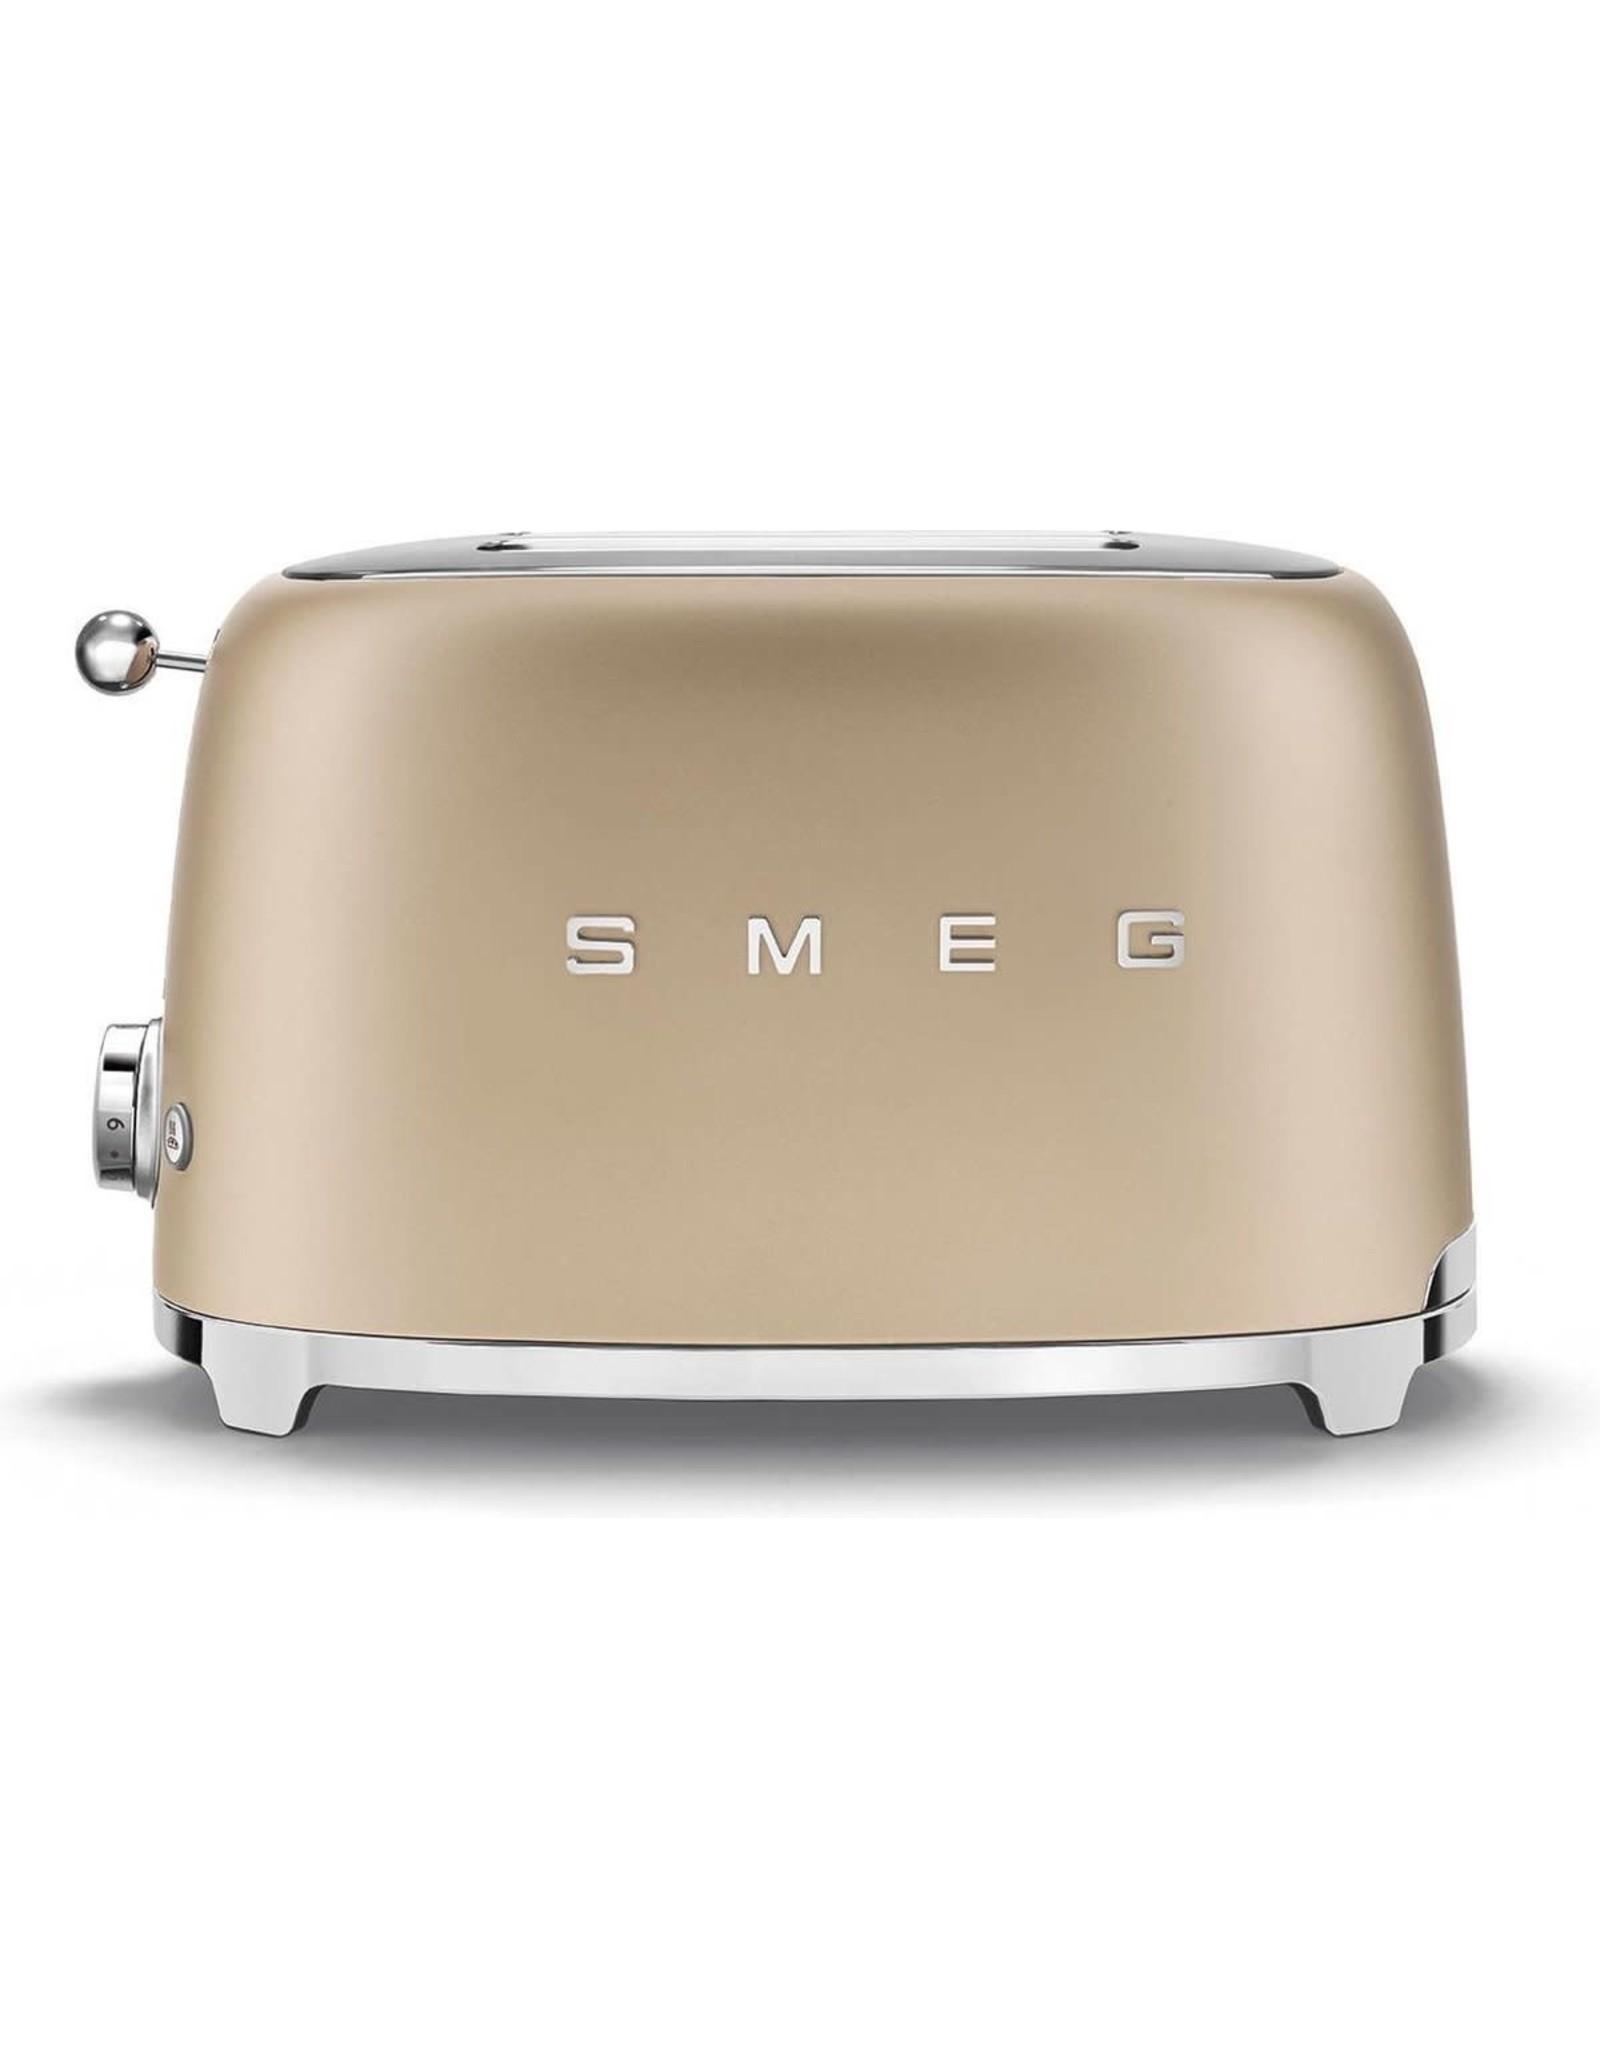 Smeg SMEG - Broodrooster - Broodrooster 2x2 Mat Champagne